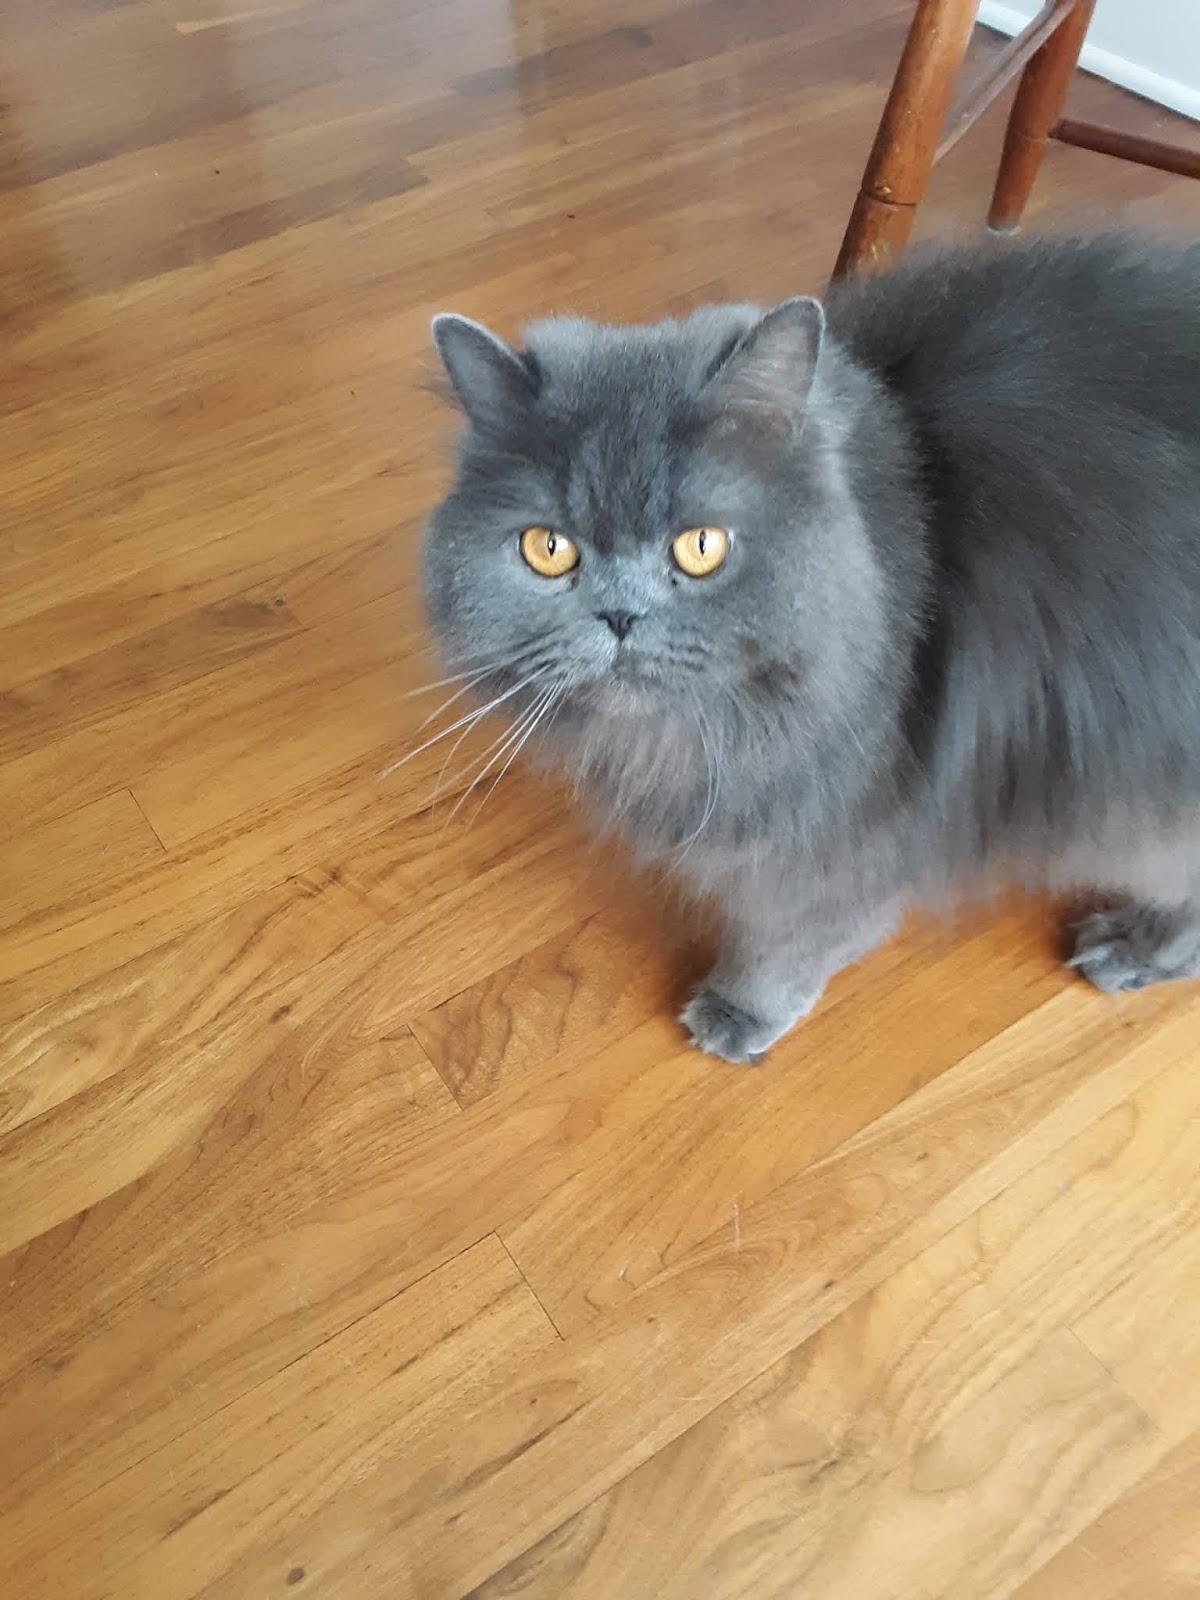 Melissa's Mochas, Mysteries and Meows: Cat Sitting #SundaySelfie